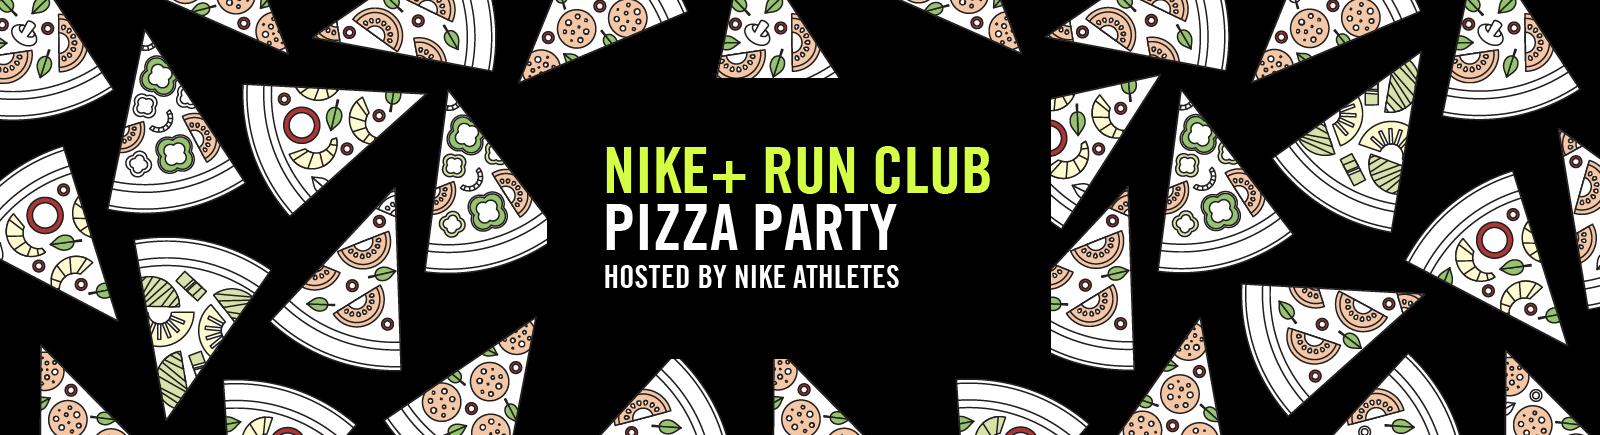 d3fd6676b1 NRC JUST DO IT SUNDAY | Nike